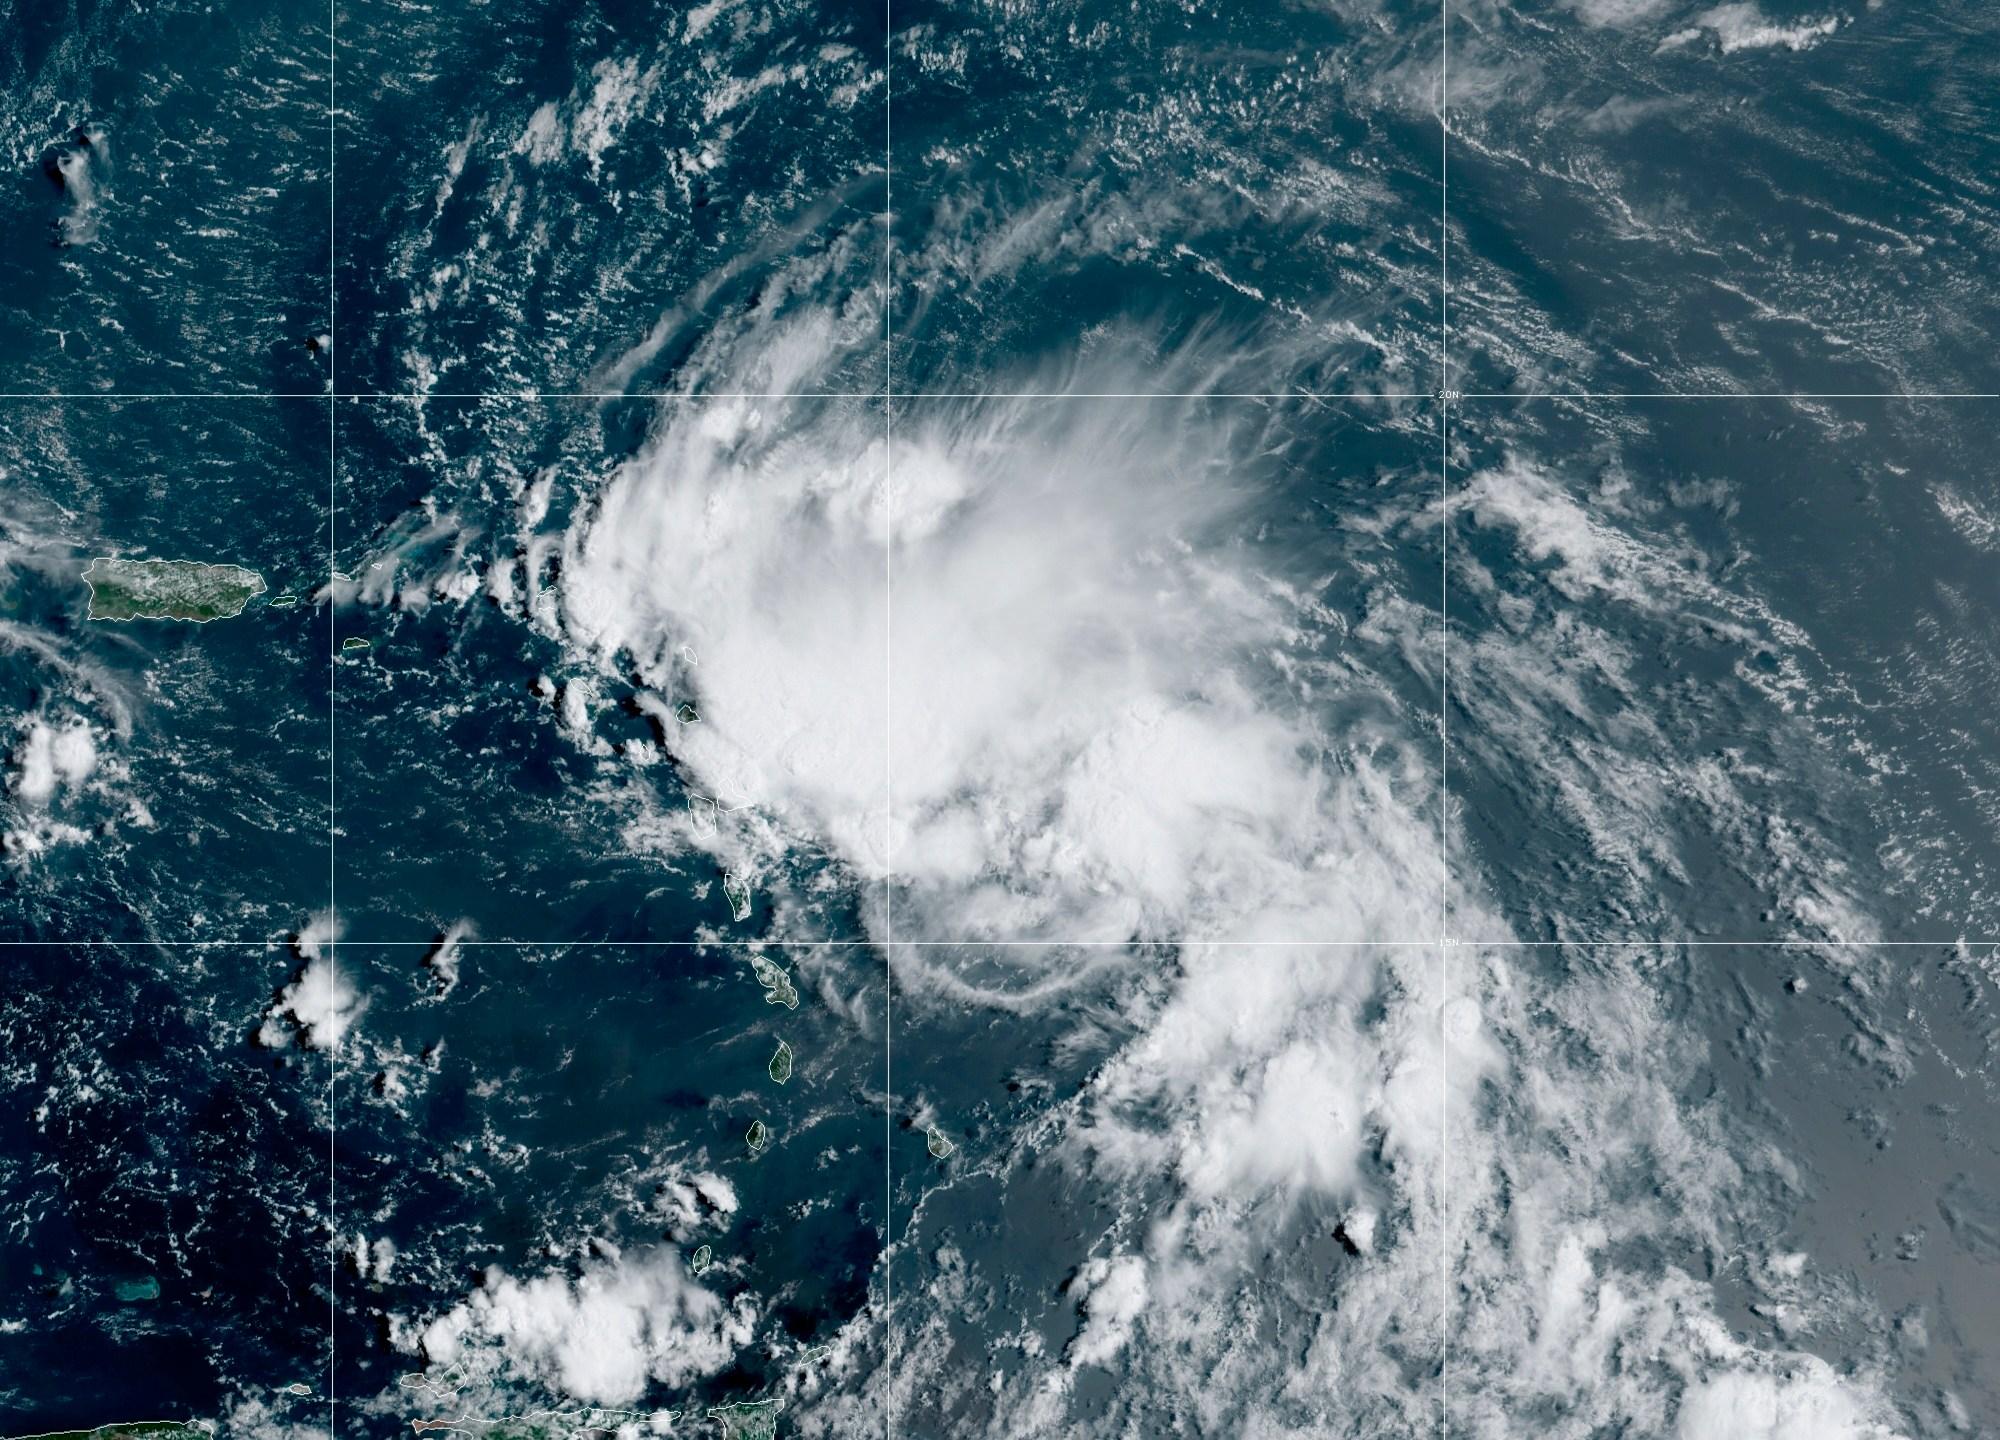 satellite image of Tropical Storm Laura in the North Atlantic Ocean